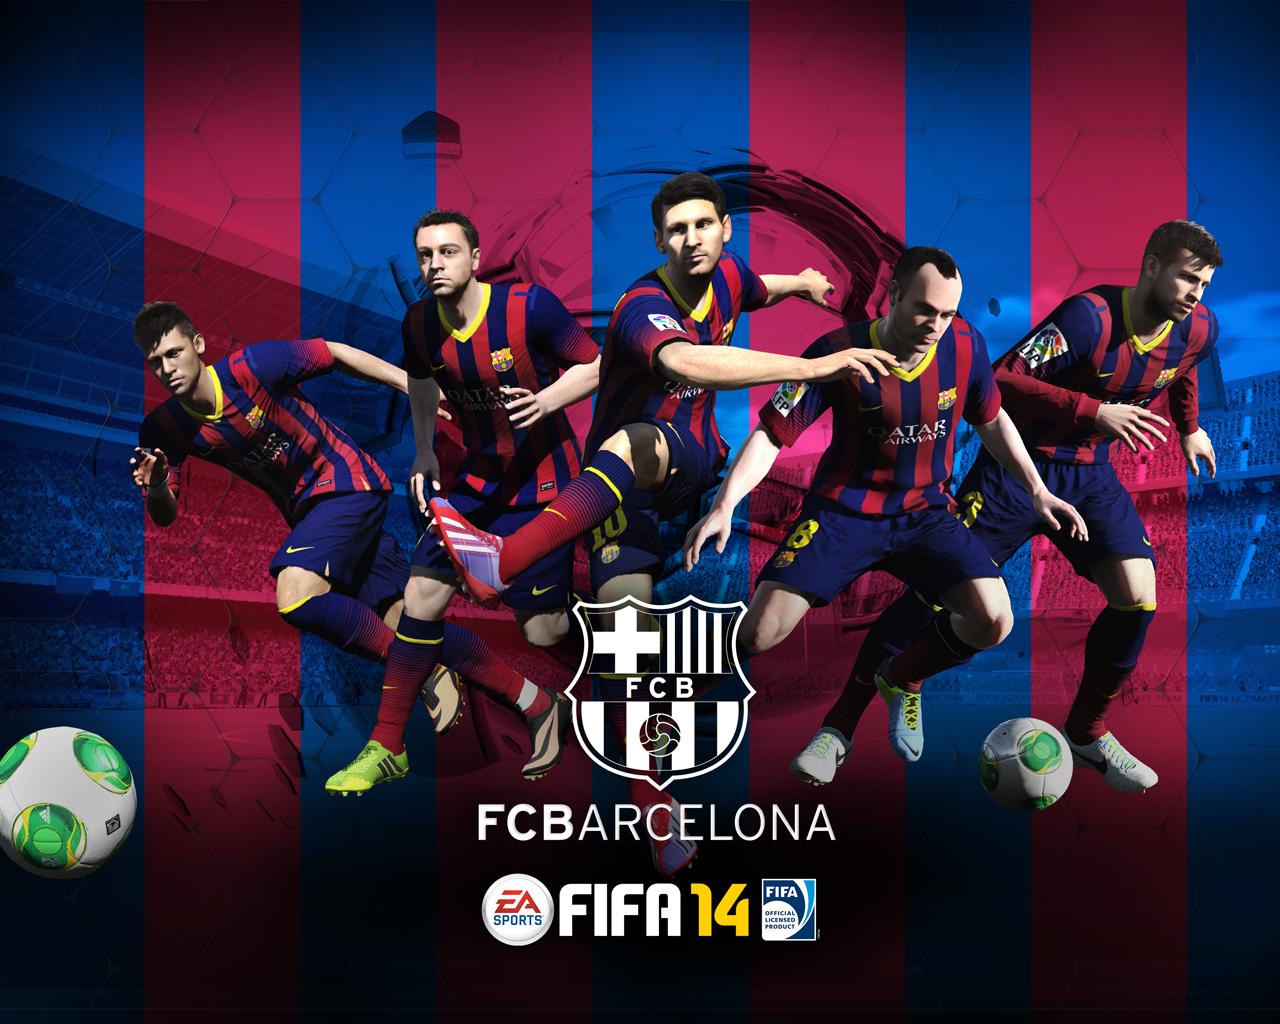 Fonds d'écran FC Barcelone